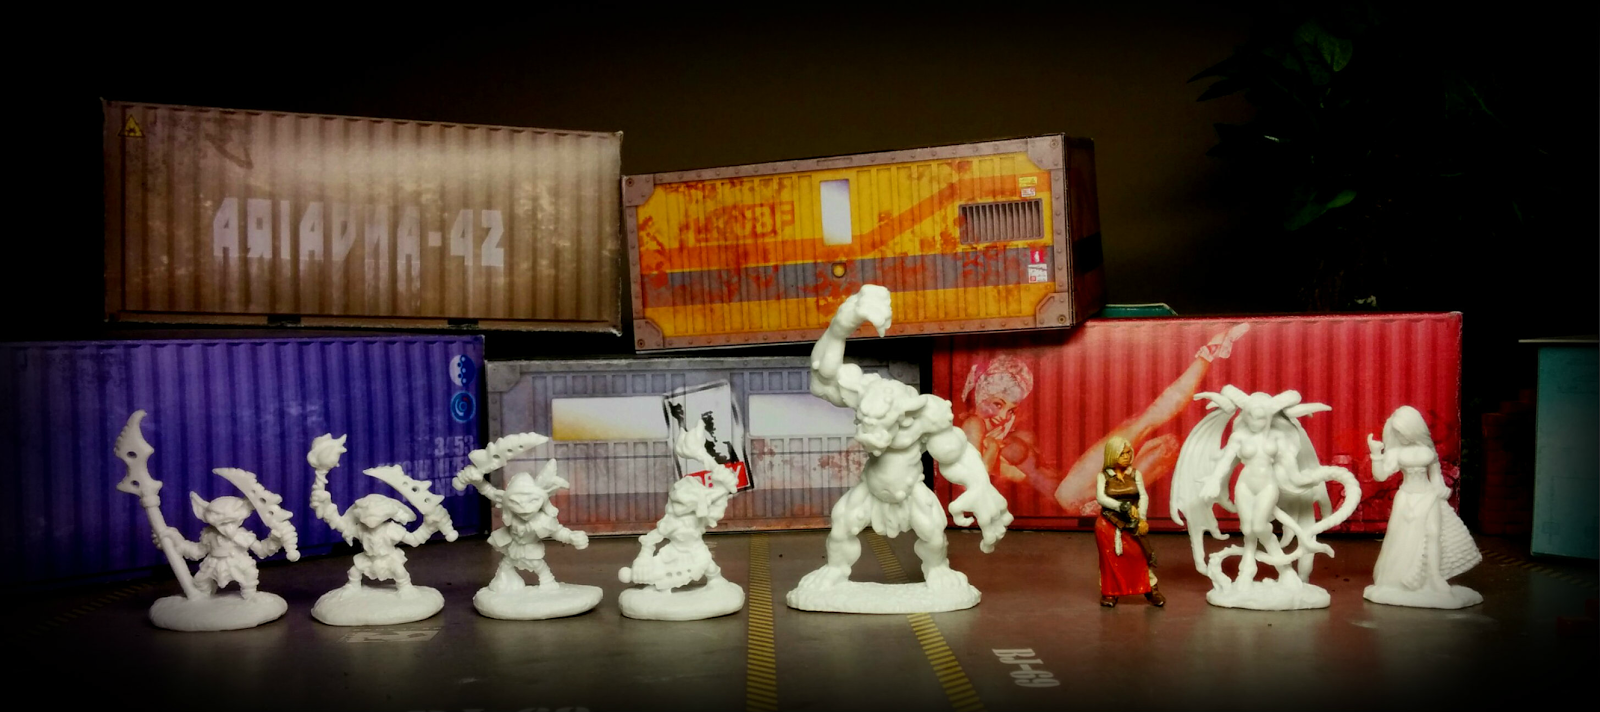 Goblin Warriors, Goblin Pyros, Cave Troll, Townsfolk: Strumpet,Virina - Female Demon - Reaper Bones,  Alicia - Hasslefree Miniatures